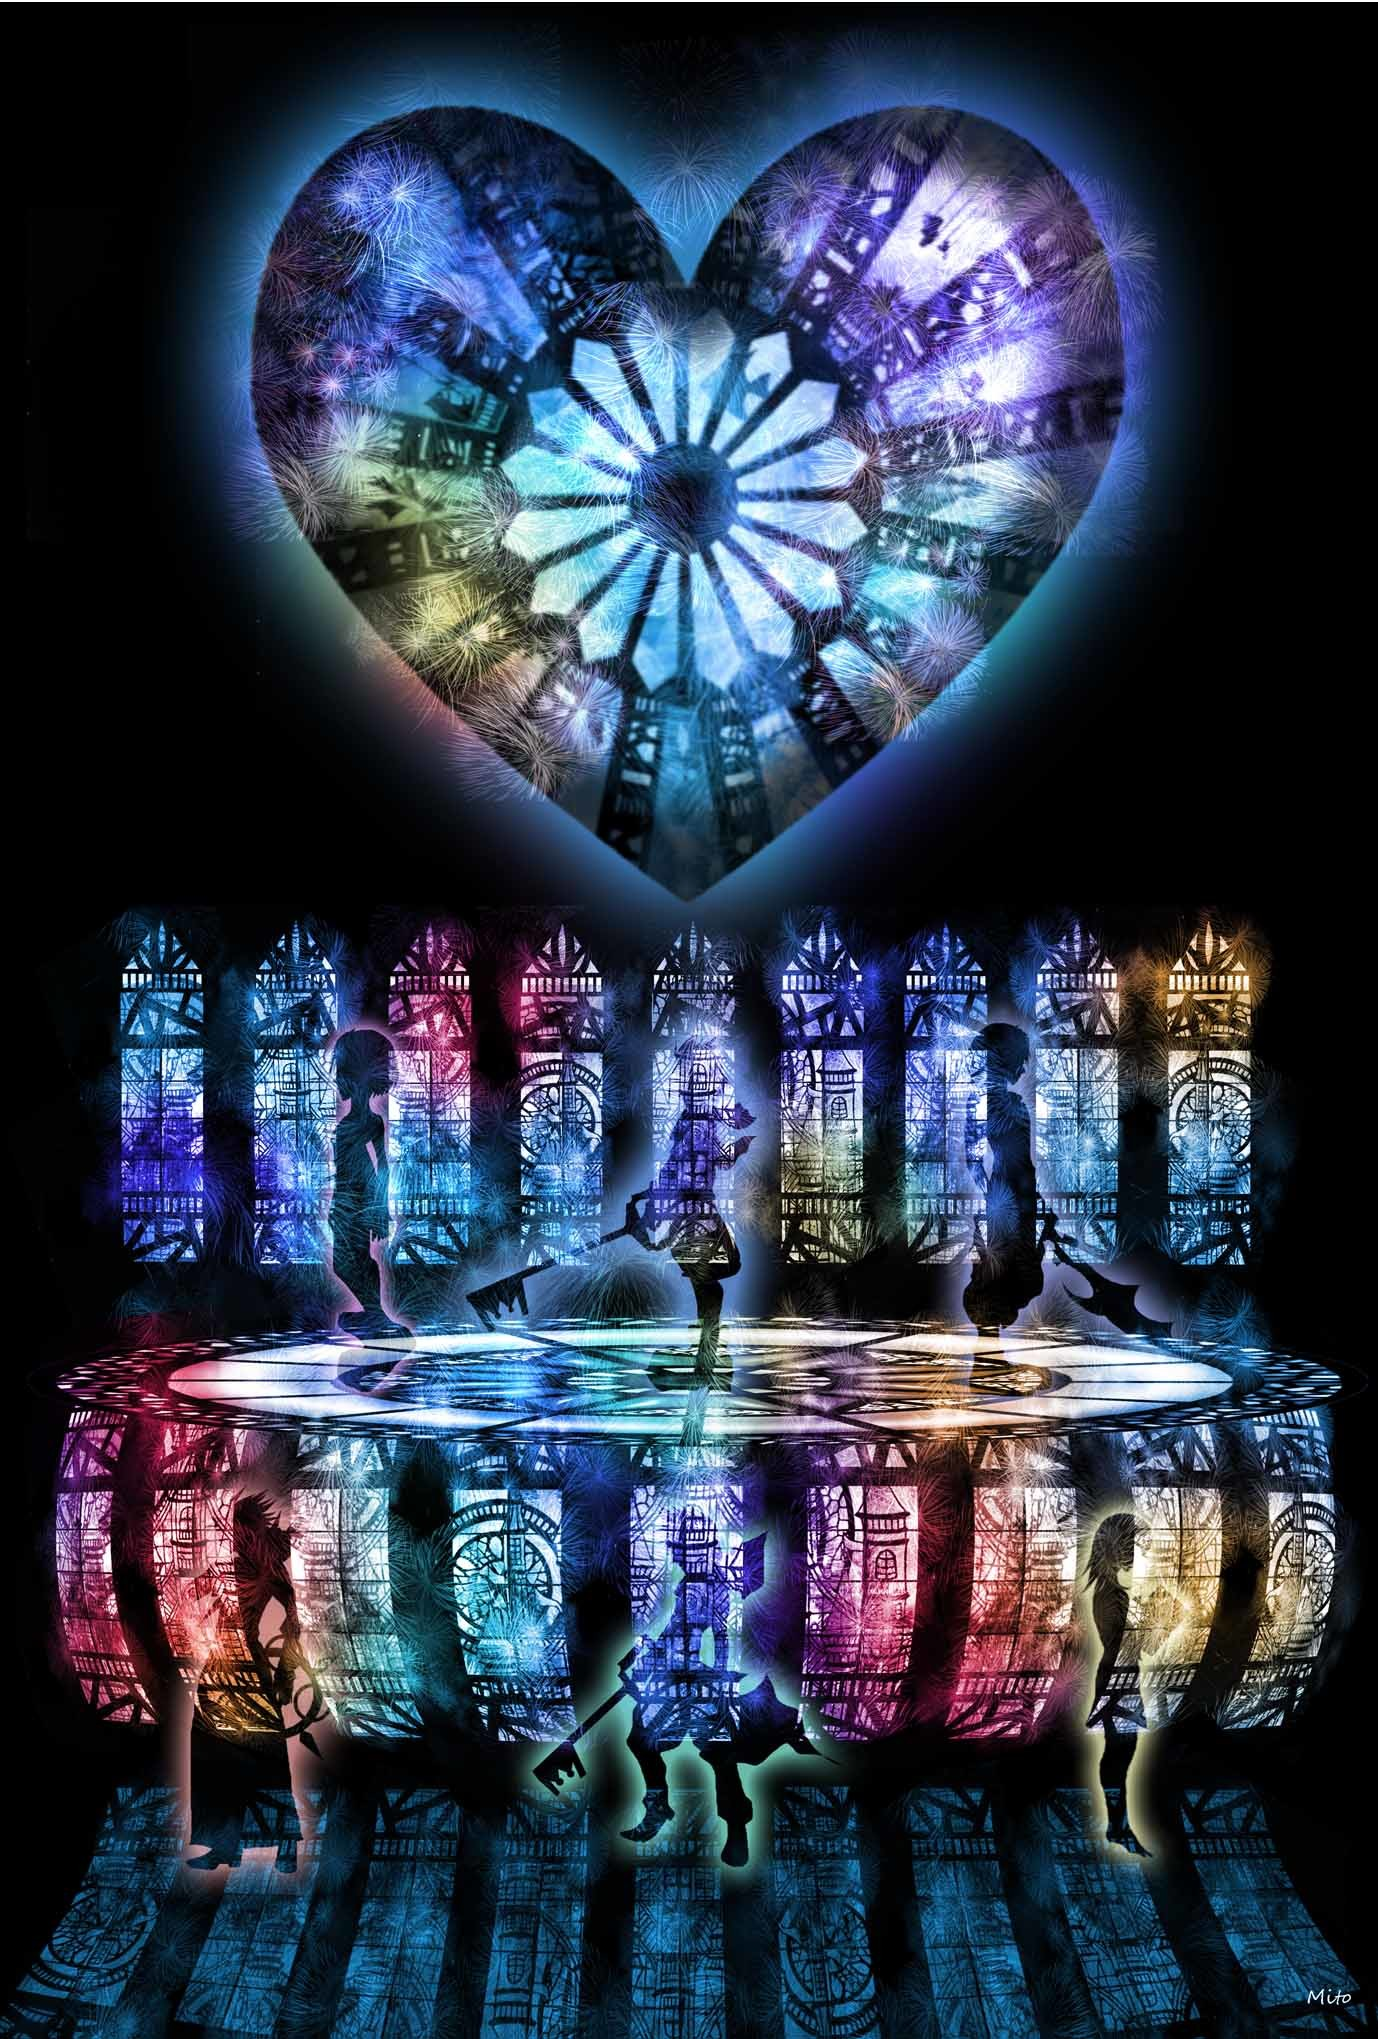 View Fullsize Kingdom Hearts Image